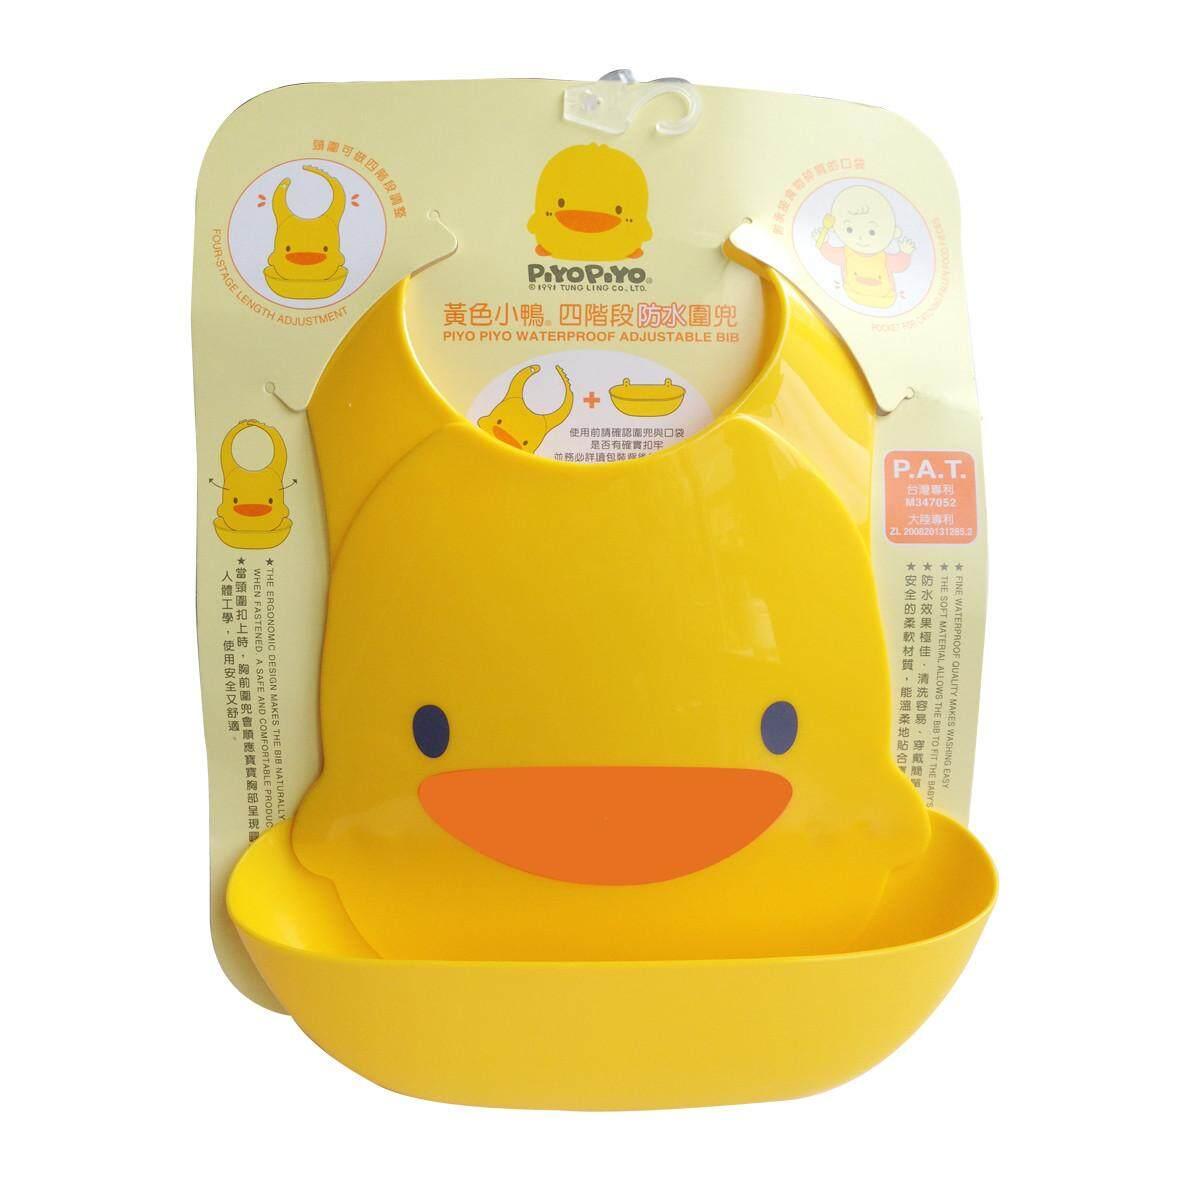 [PIYOPIYO] Adjustable Waterproof Bib with Food Catching Tray